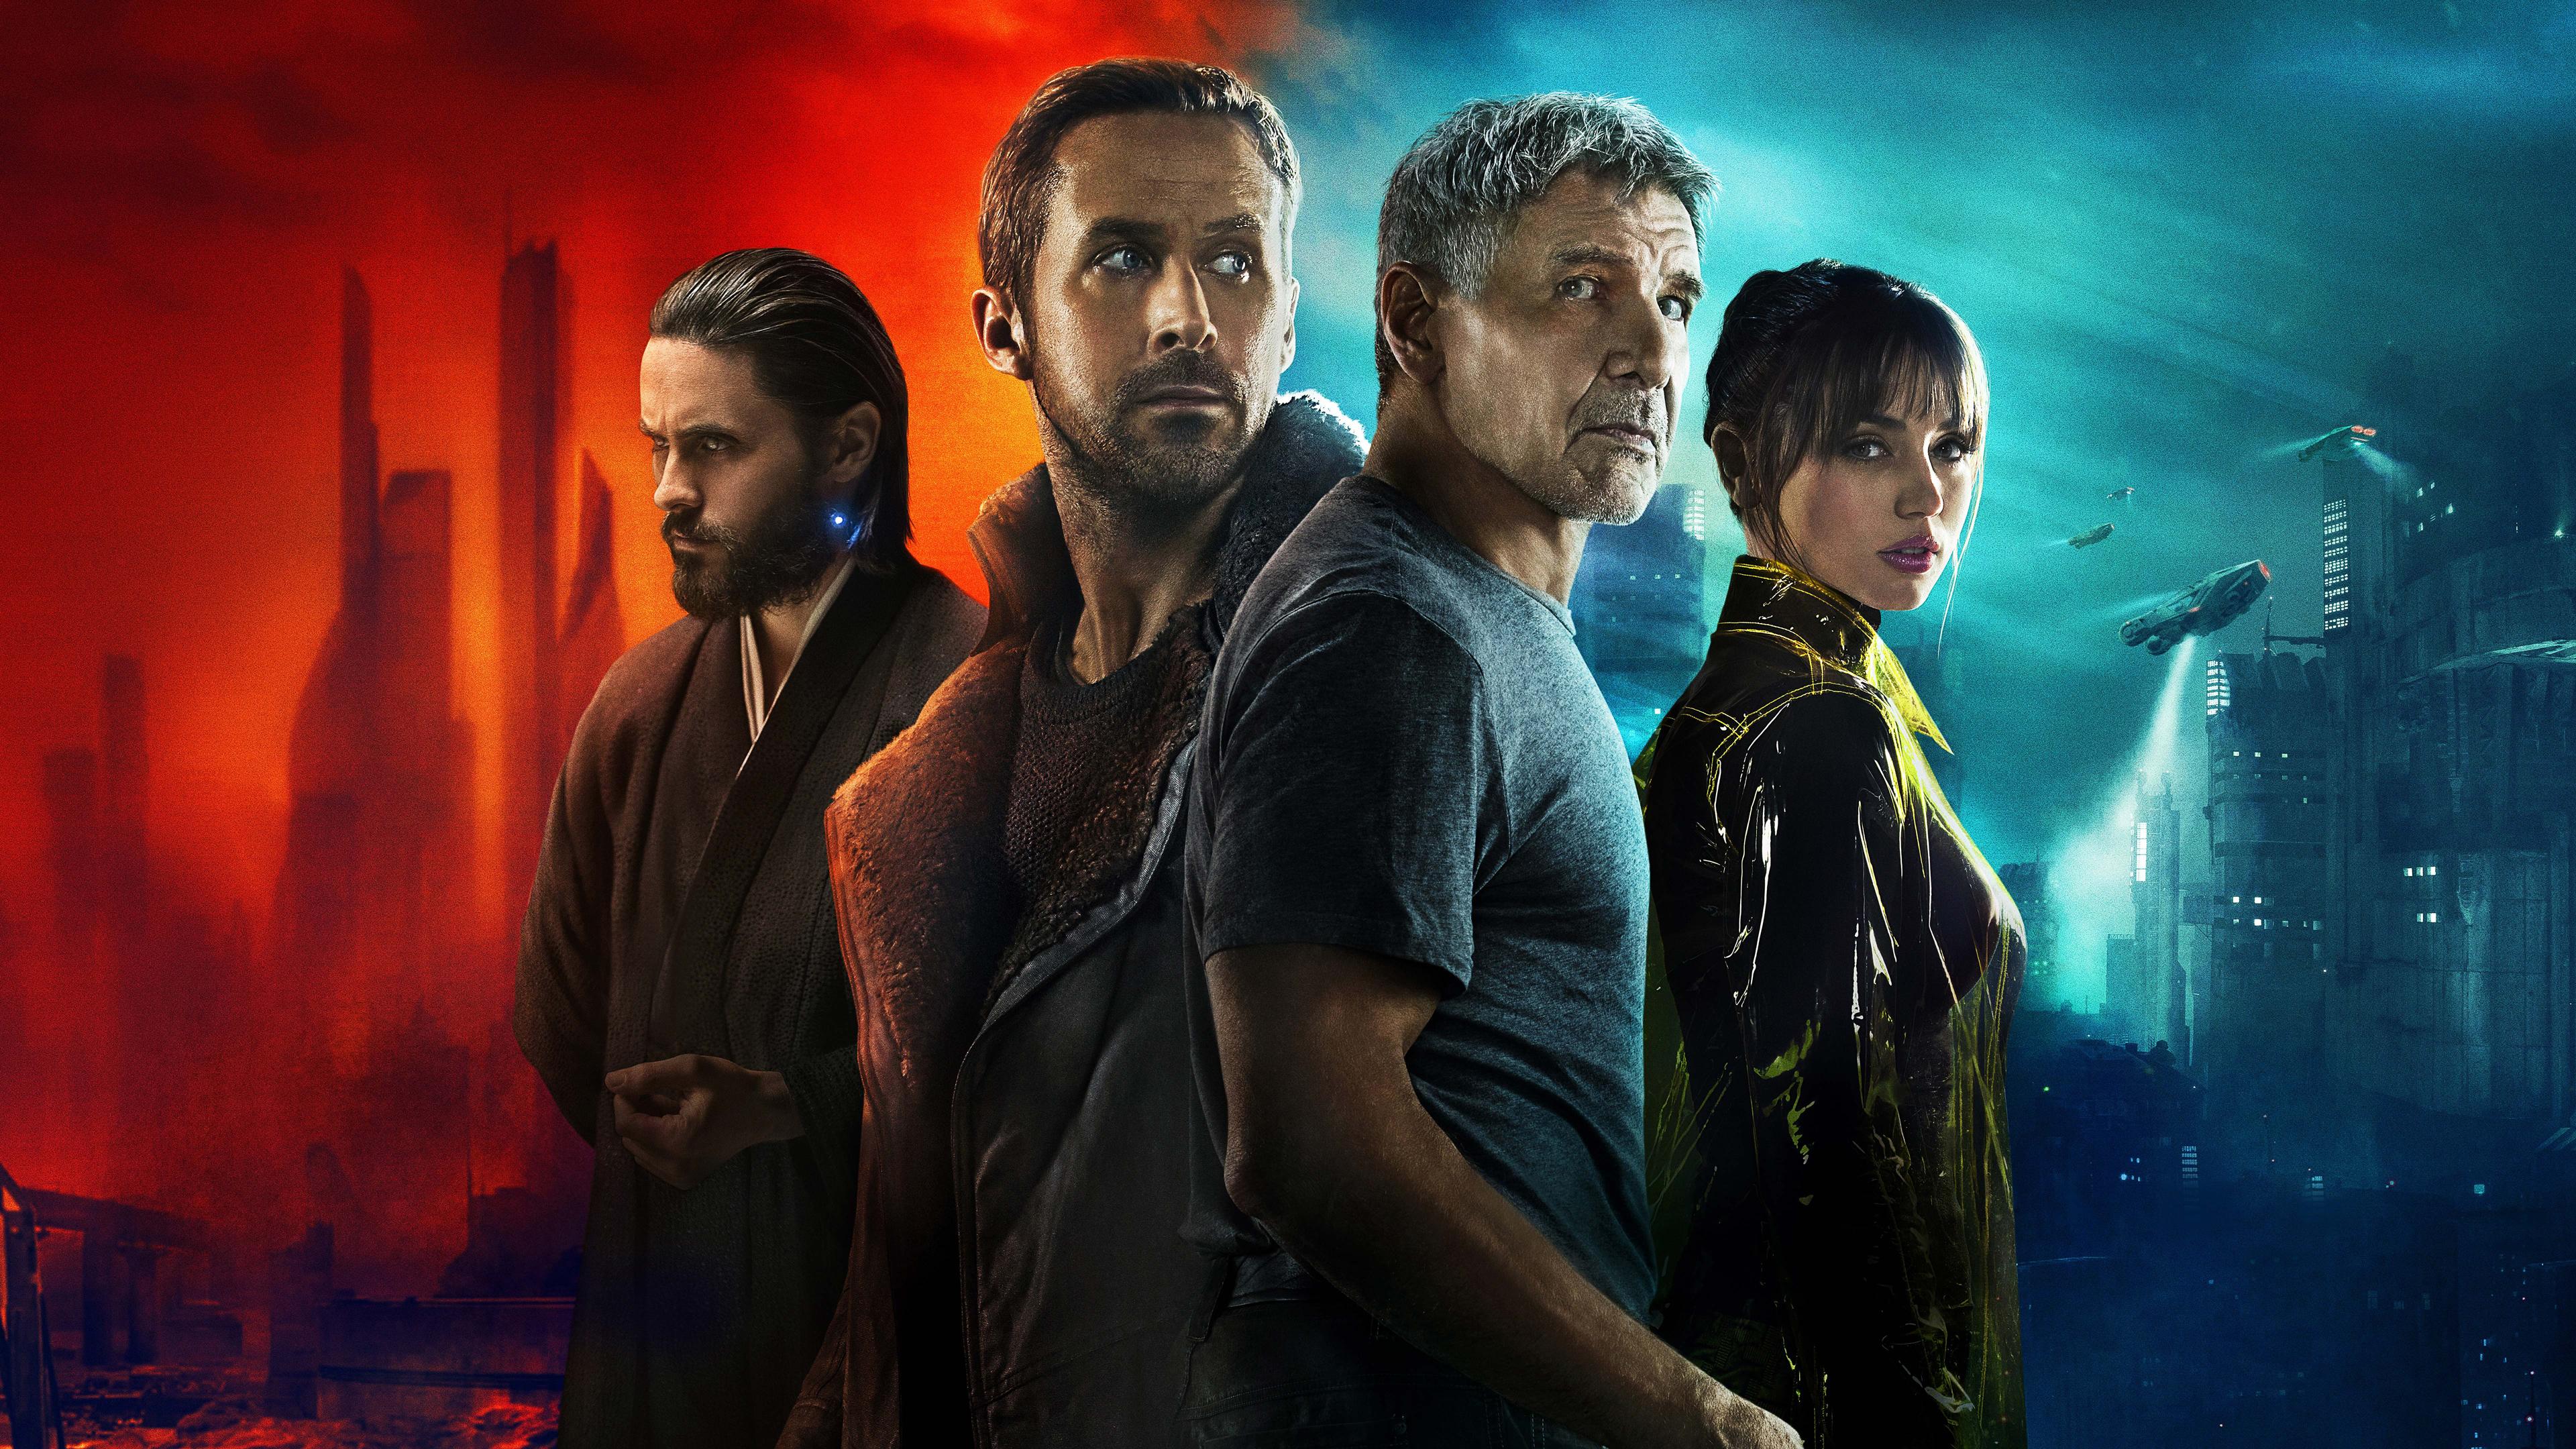 Blade Runner 2049 Ps4wallpapers Com